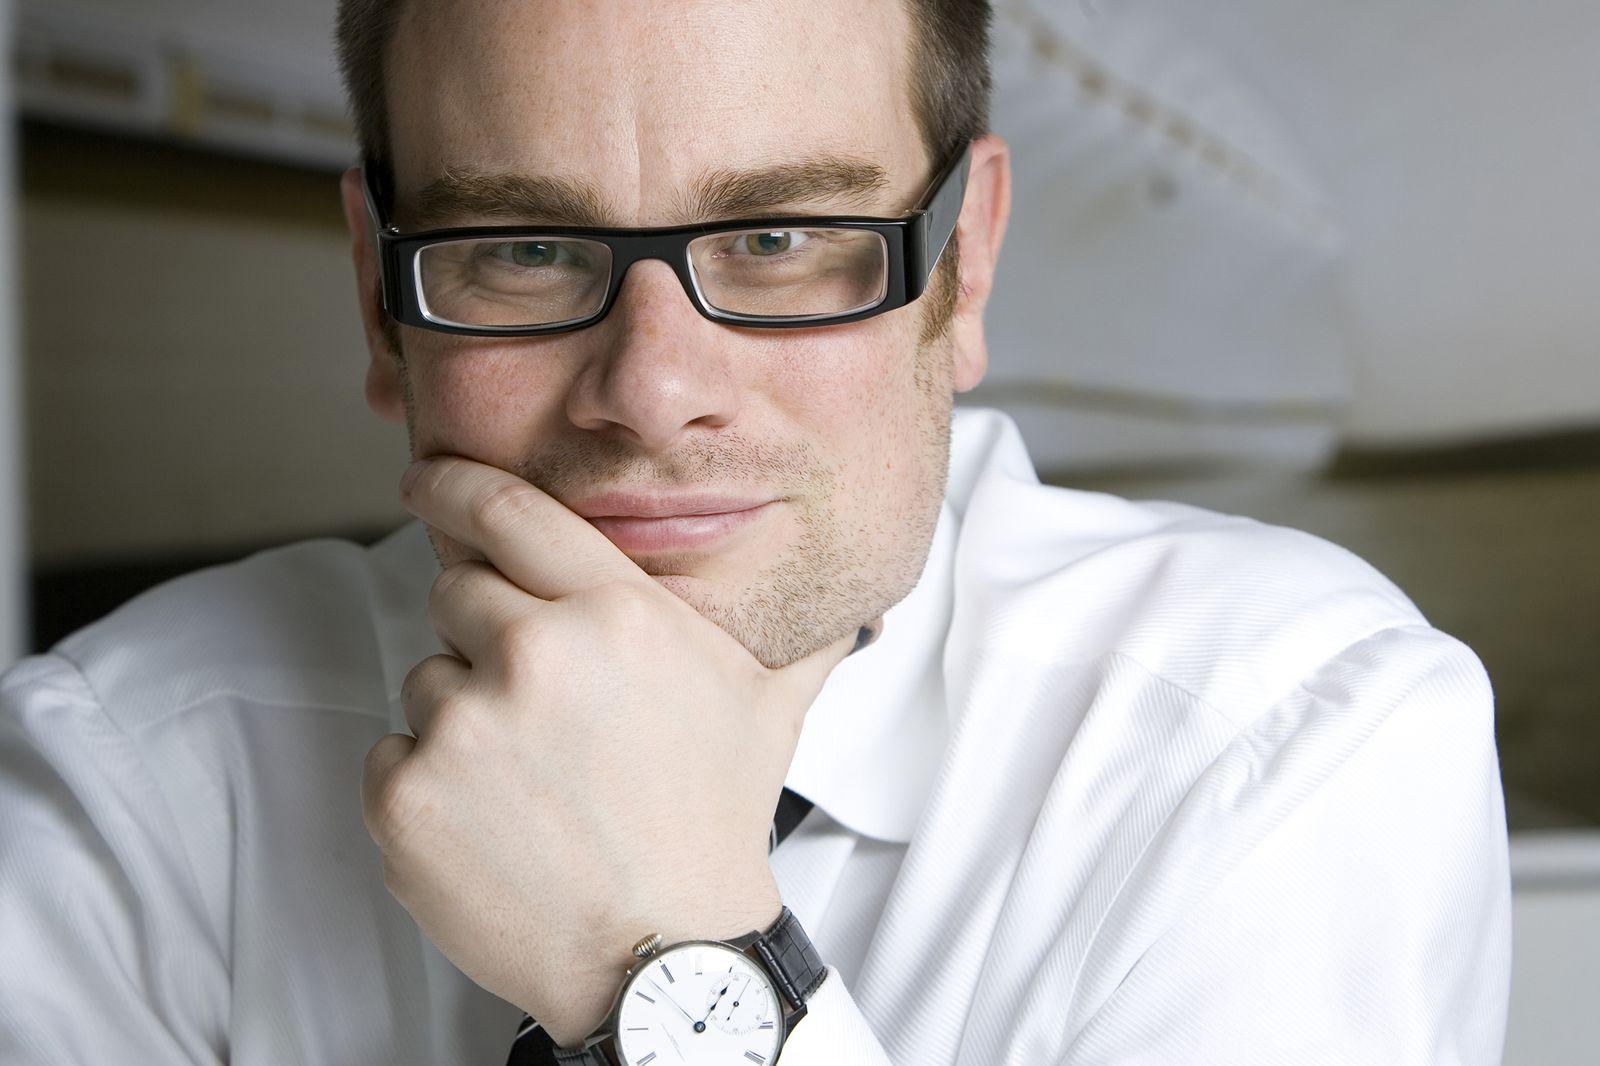 Zeppelin University / Präsident Prof. Dr. Stephan A. Jansen